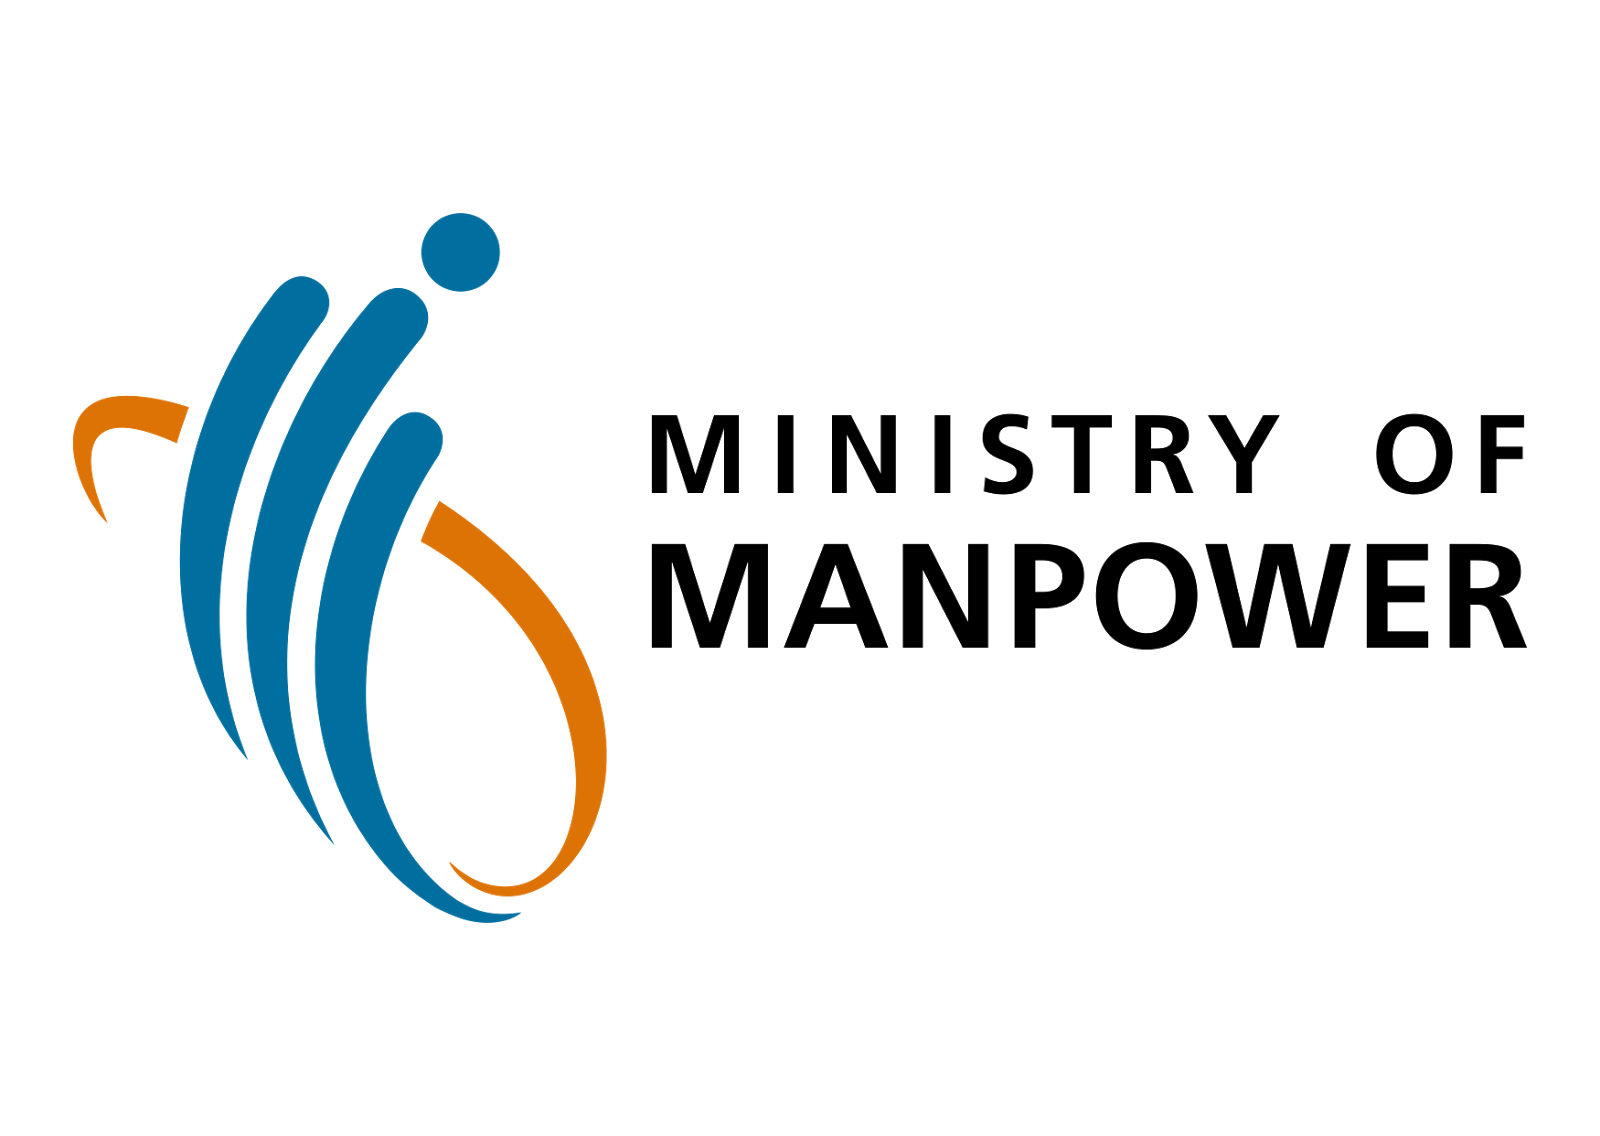 Ministry of manpower logo vector